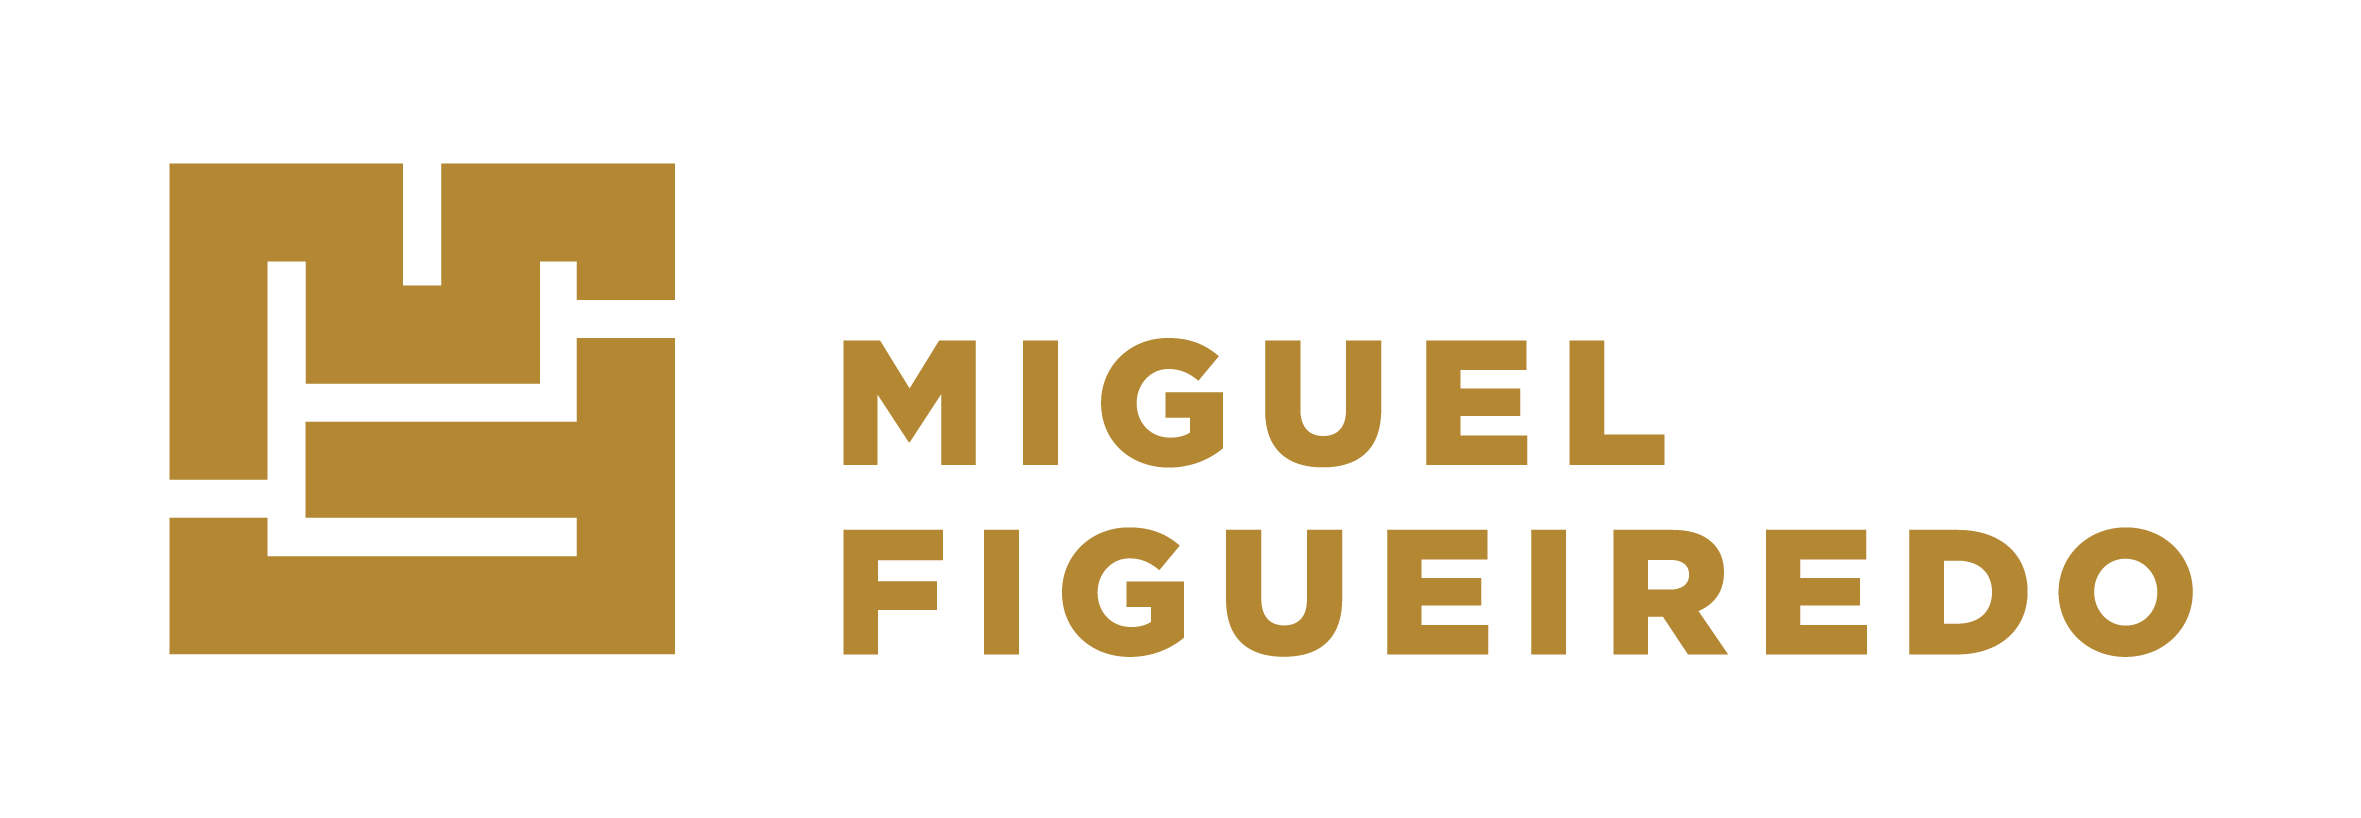 Miguel Figueiredo